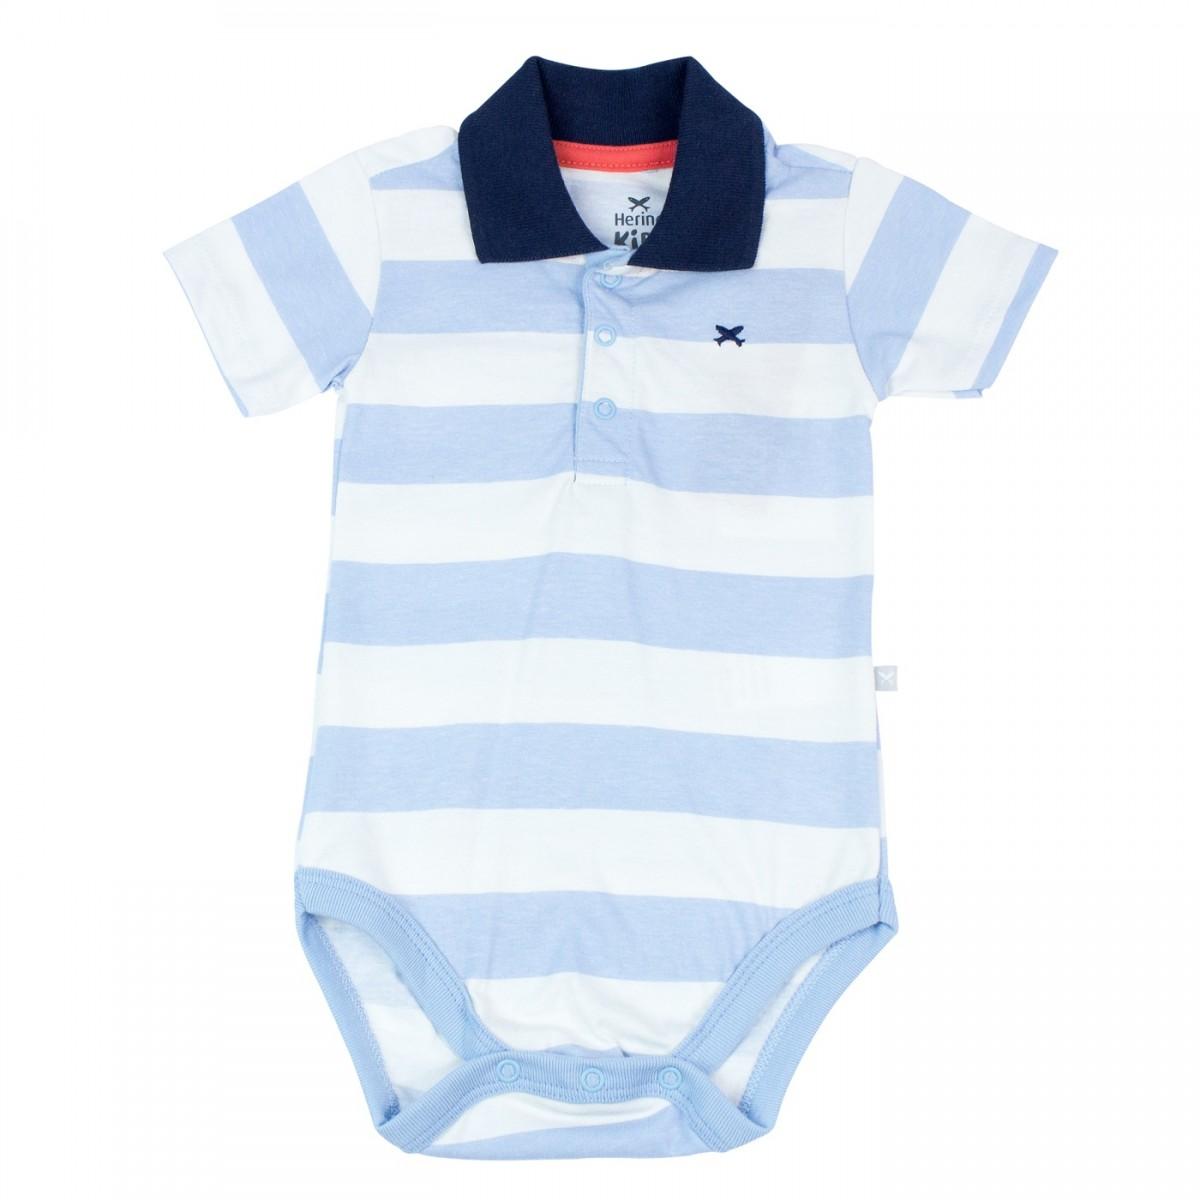 34c49e3675f2 Bizz Store - Body Bebê Masculino Hering Kids Listrado Gola Polo